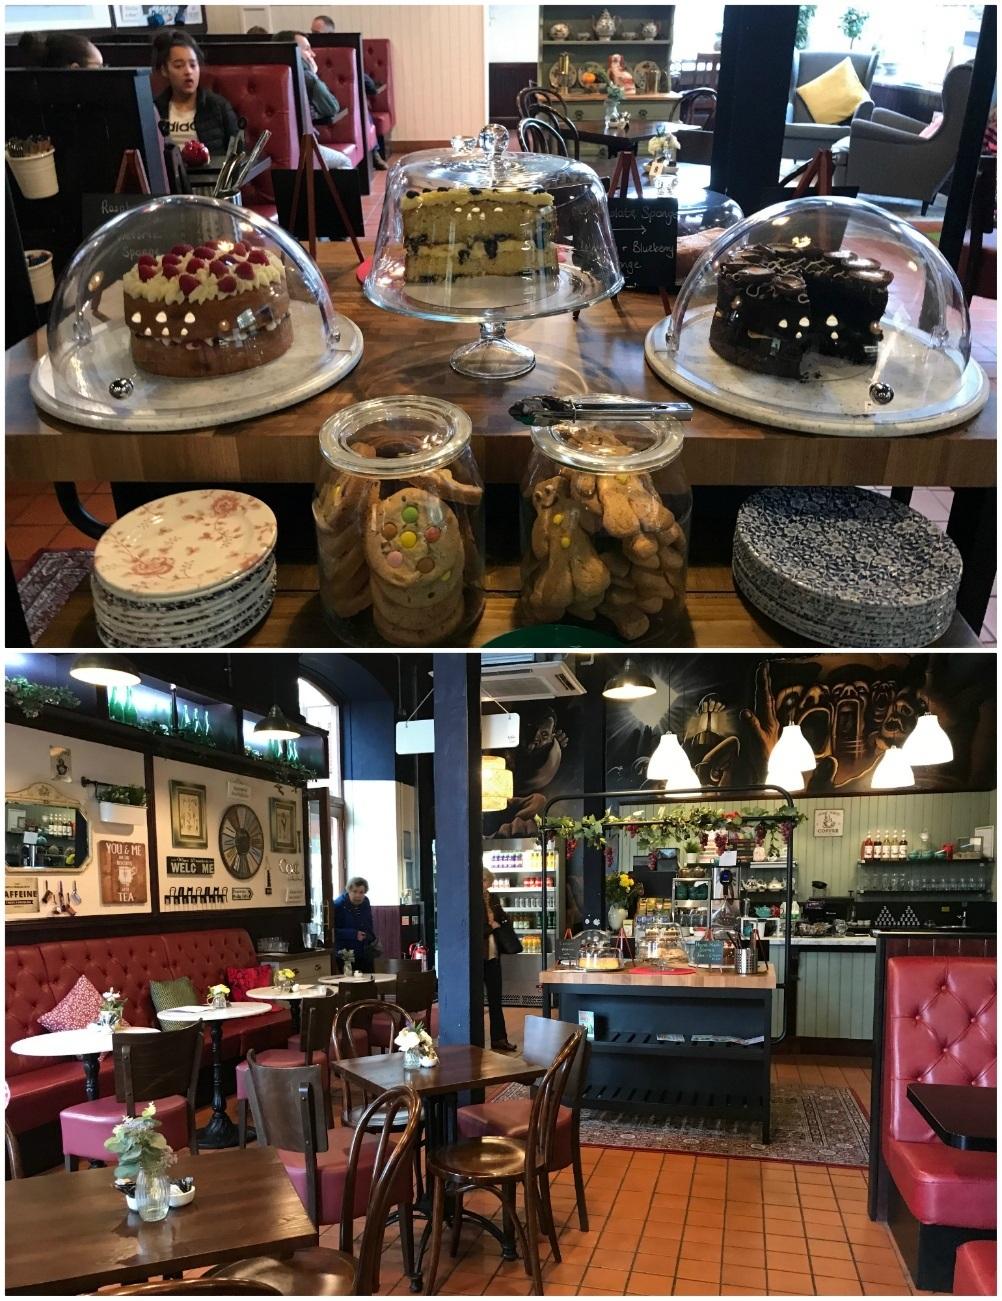 Bracchi Cafe at Rhondda Wales Photo Heatheronhertravels.com